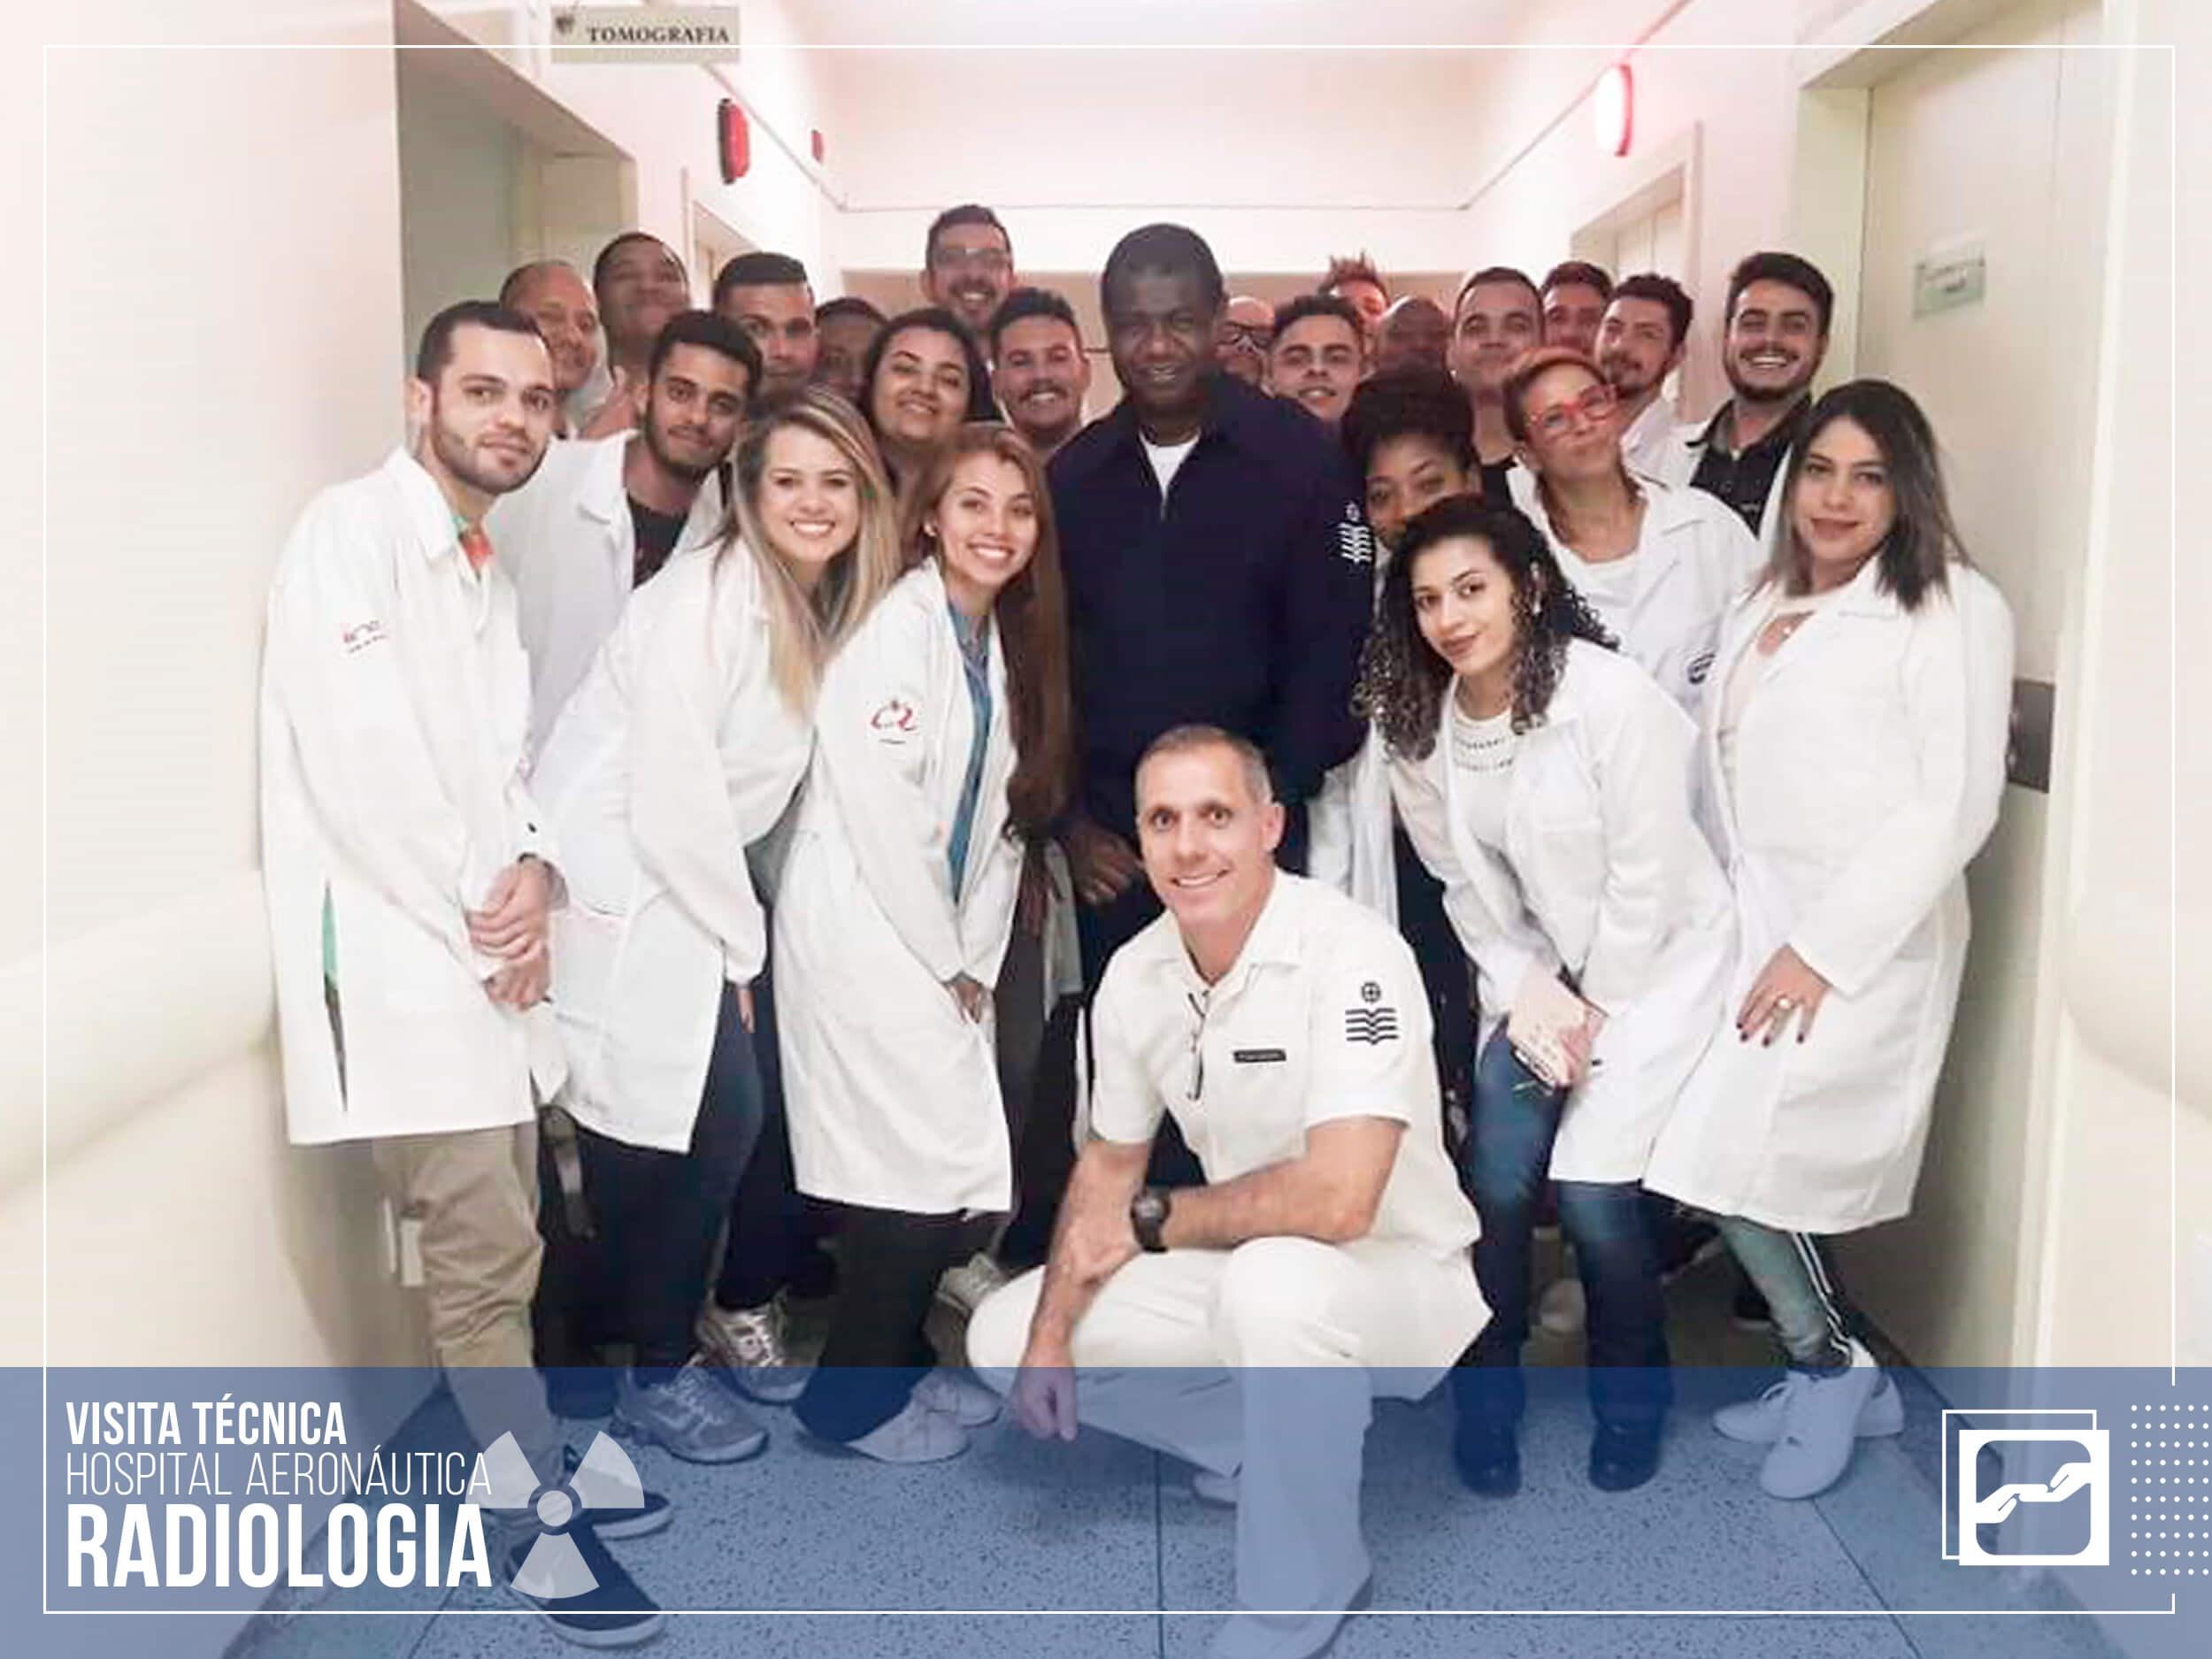 visita_tecnica_hospital_aeronautica_radiologia_famesp